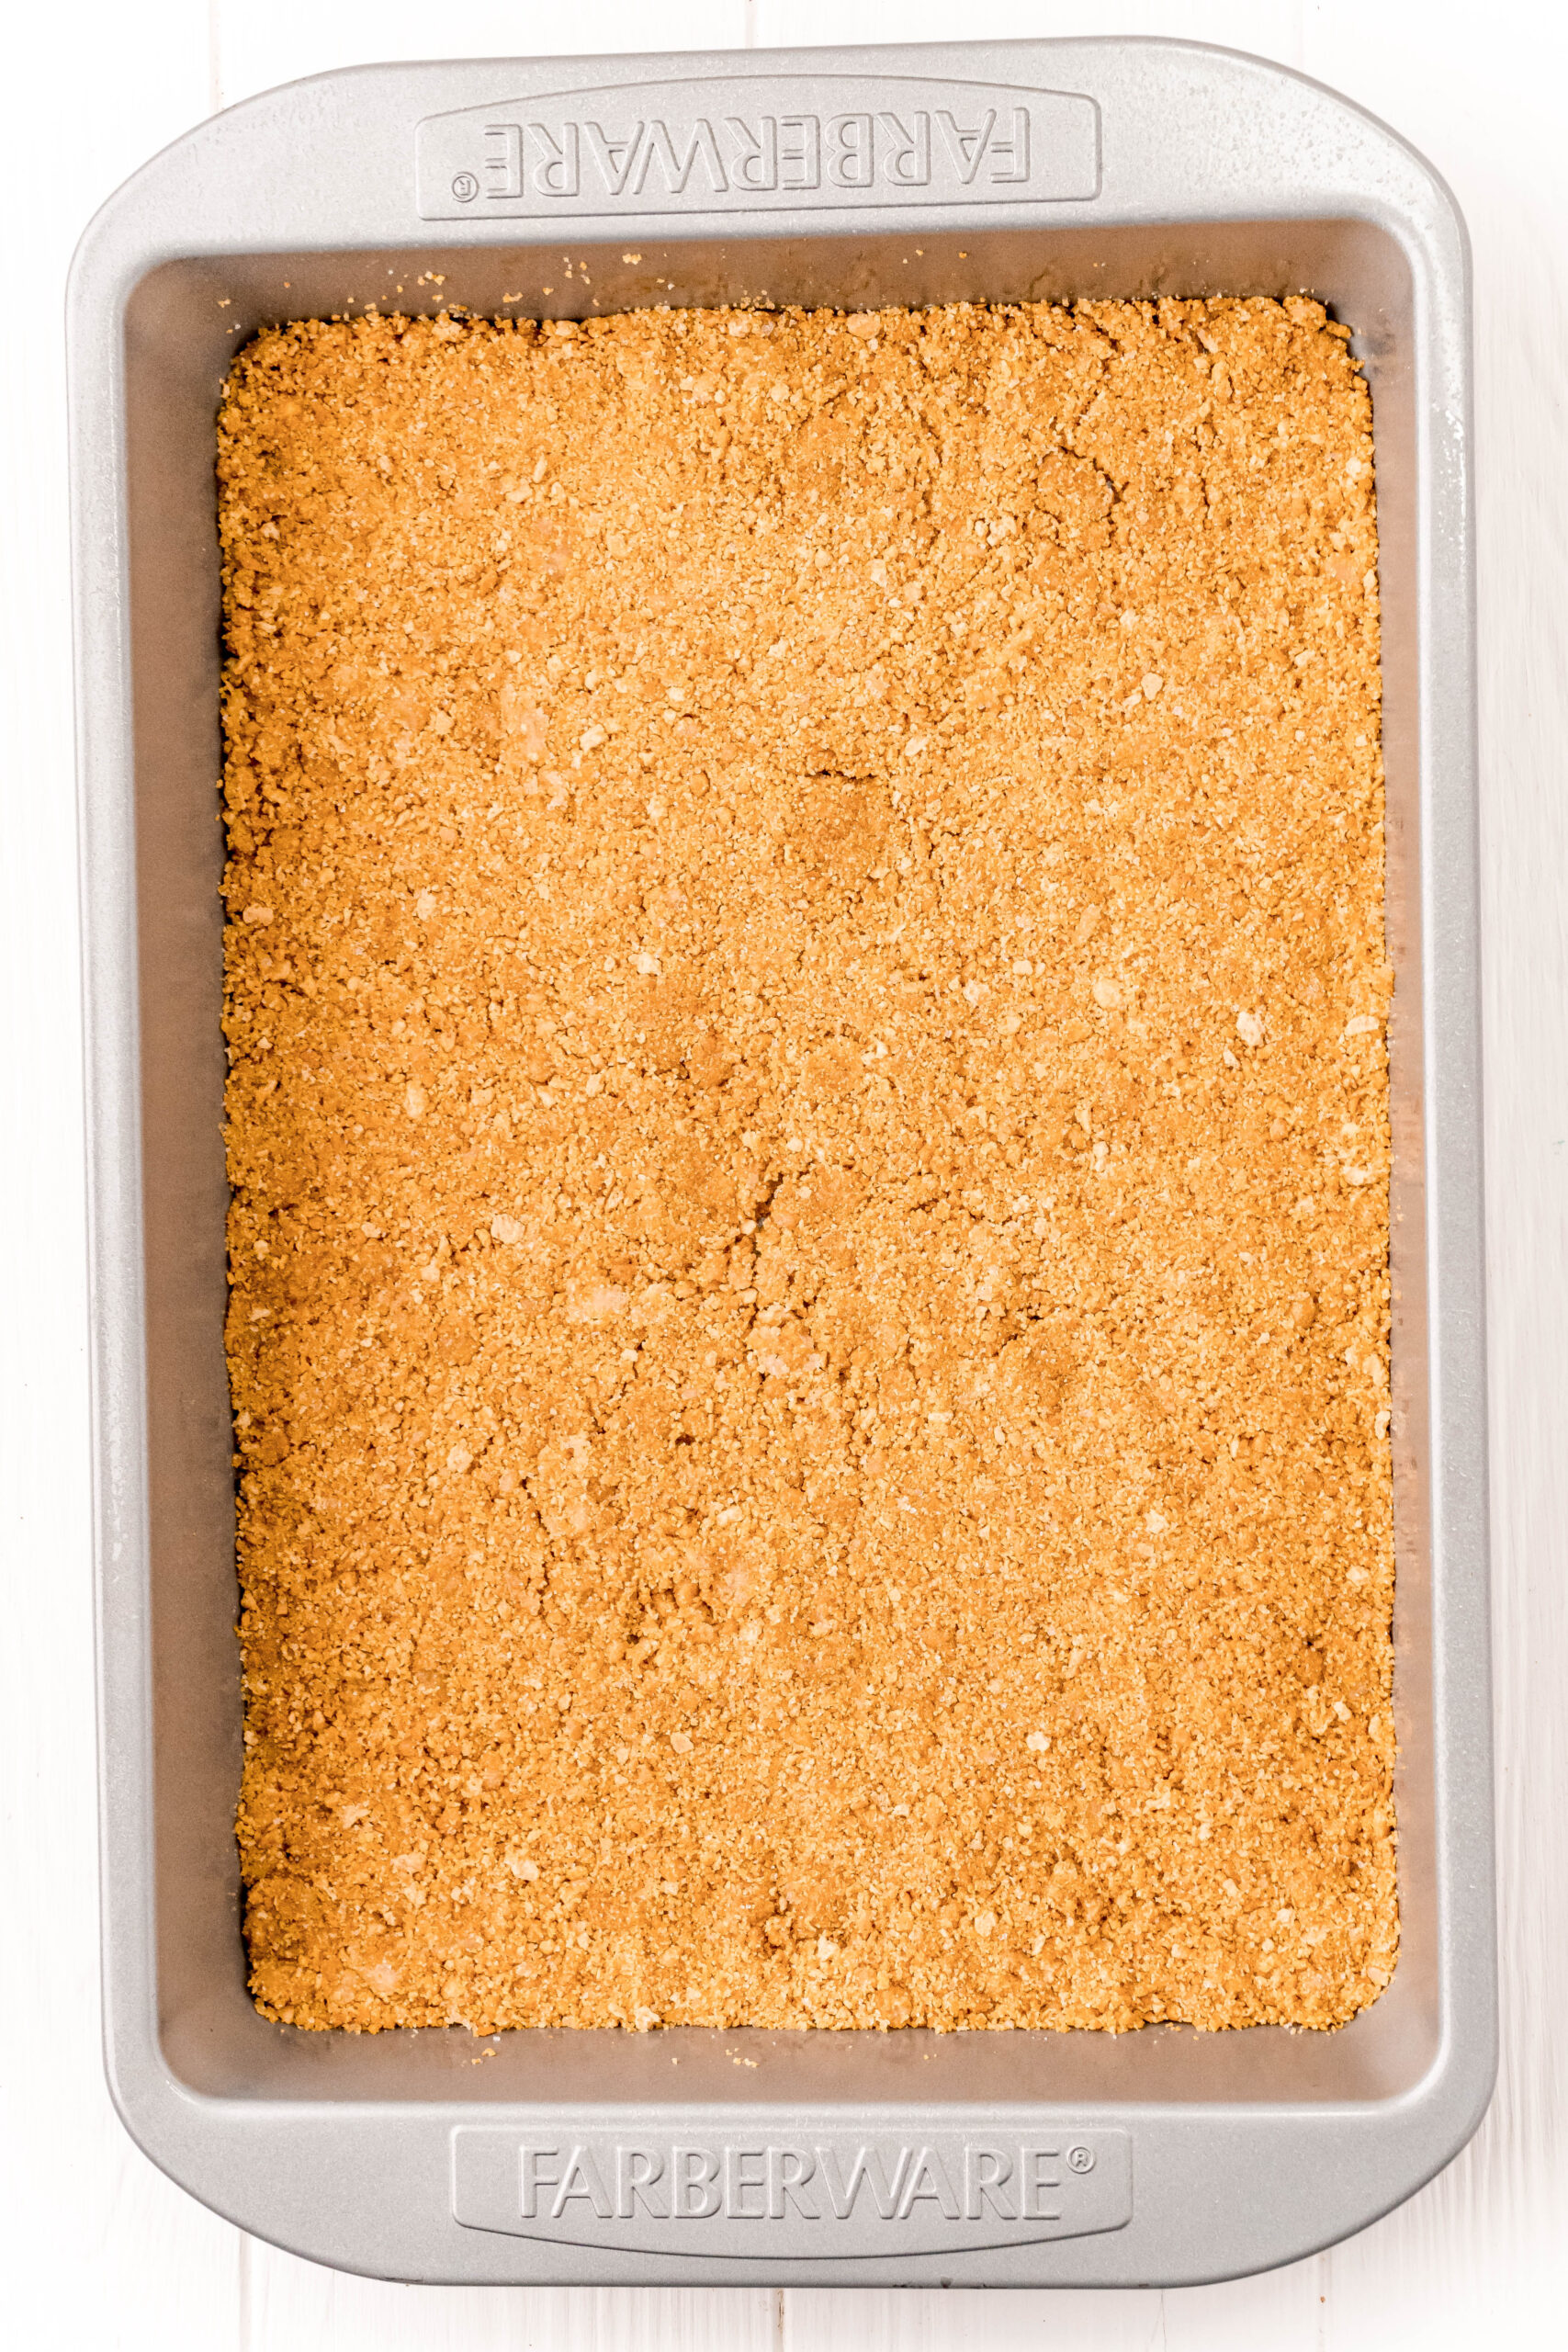 baking pan with a graham cracker crust